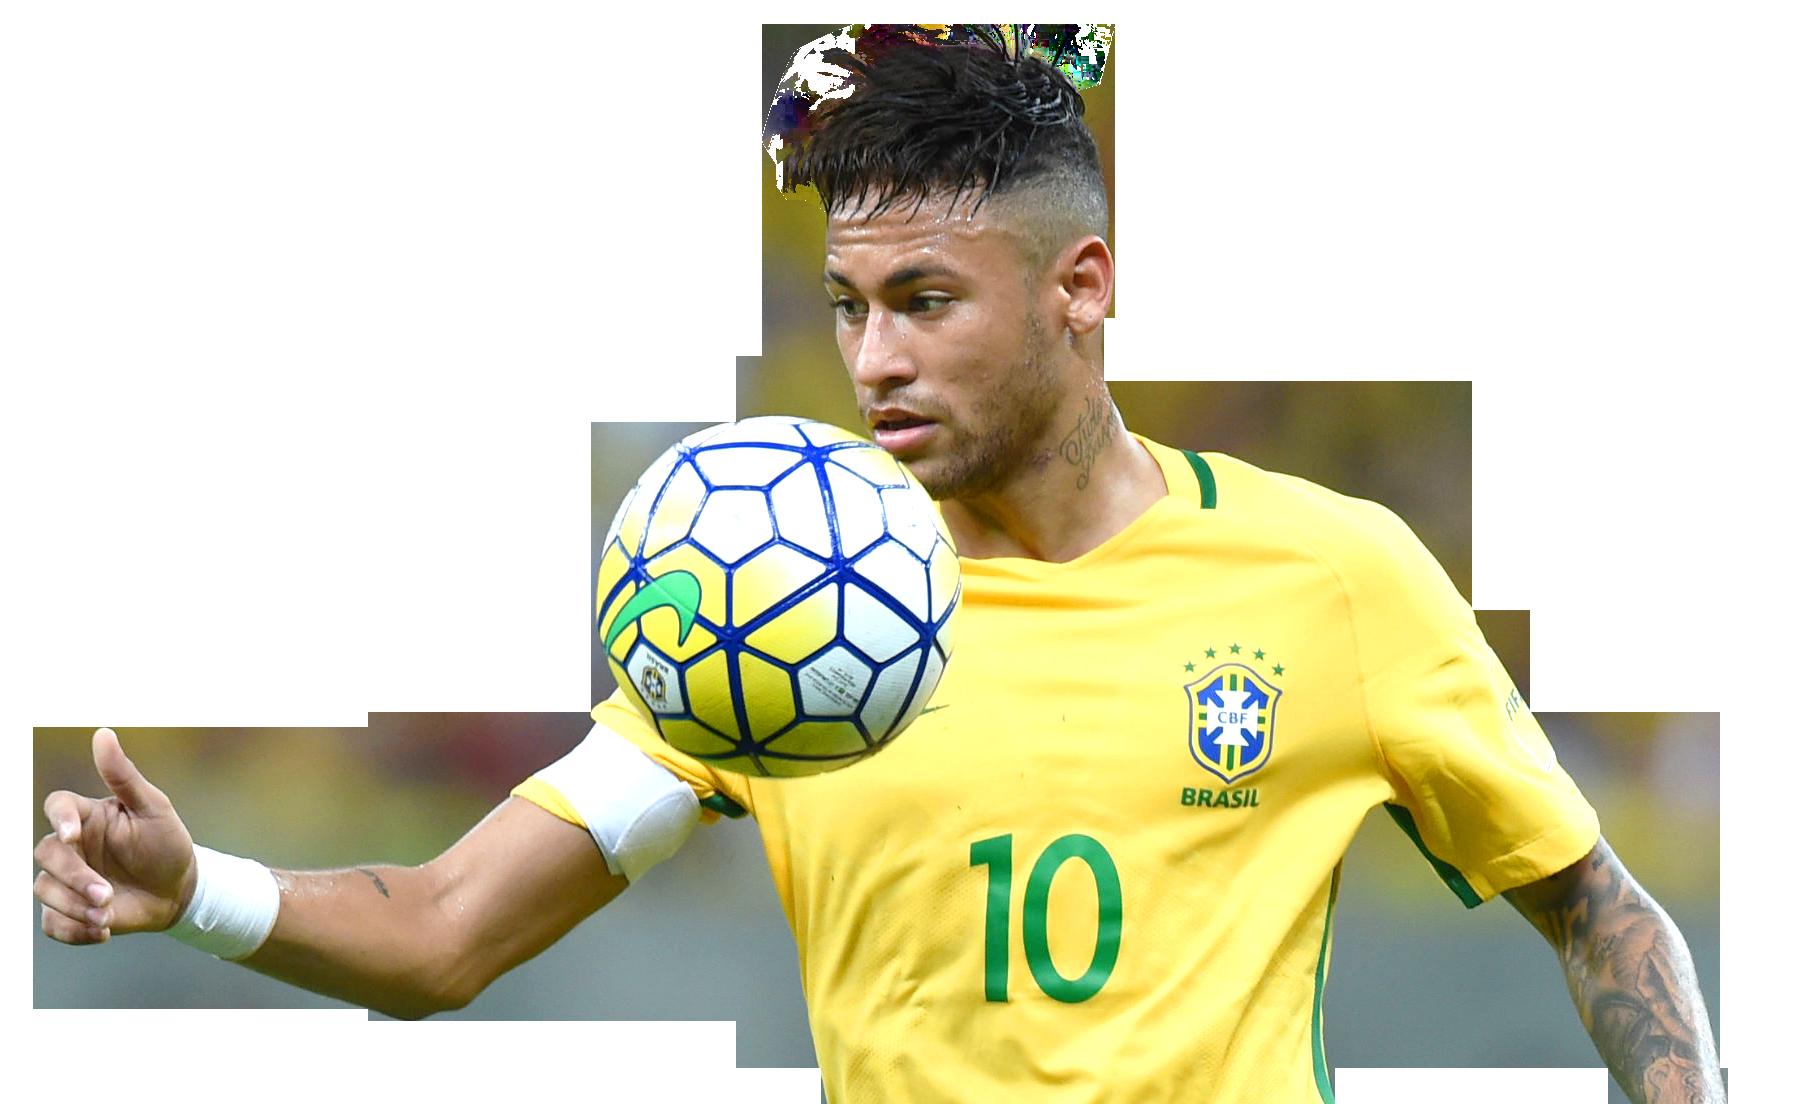 neymar png image transparent